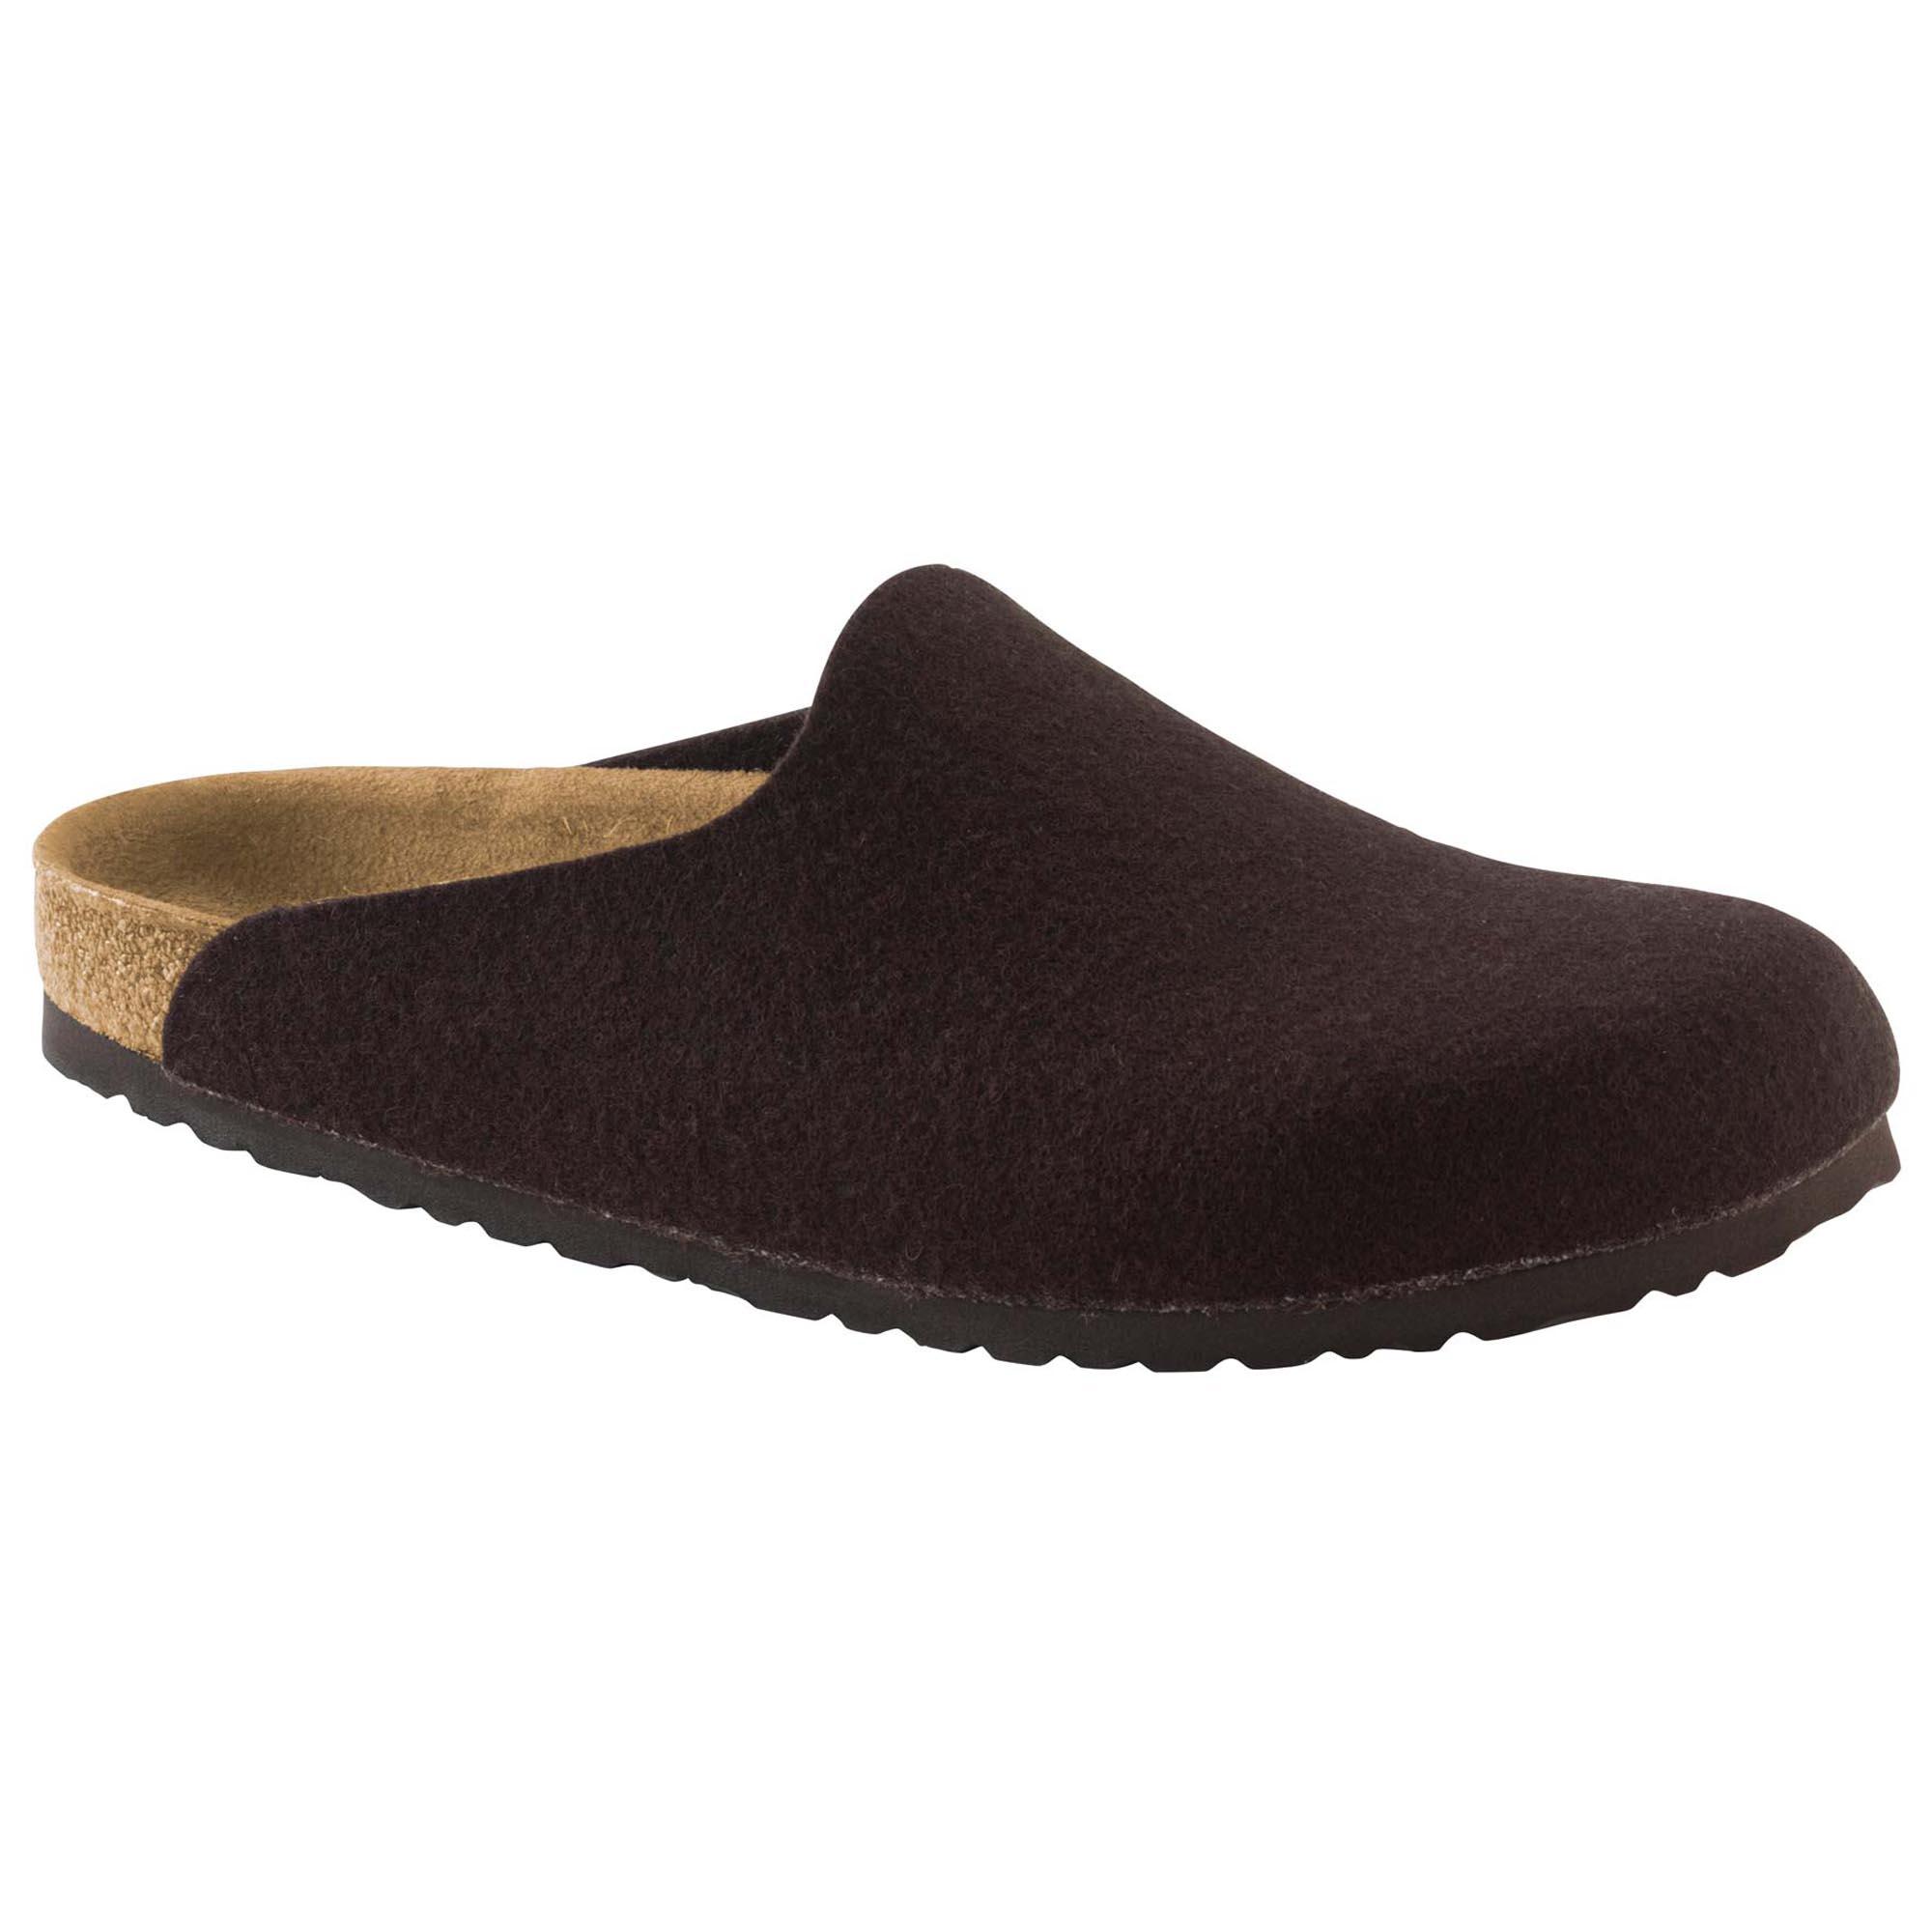 Details about Birkenstock Amsterdam Felt Clogs Shoes Slippers Mules Clog Sandal show original title